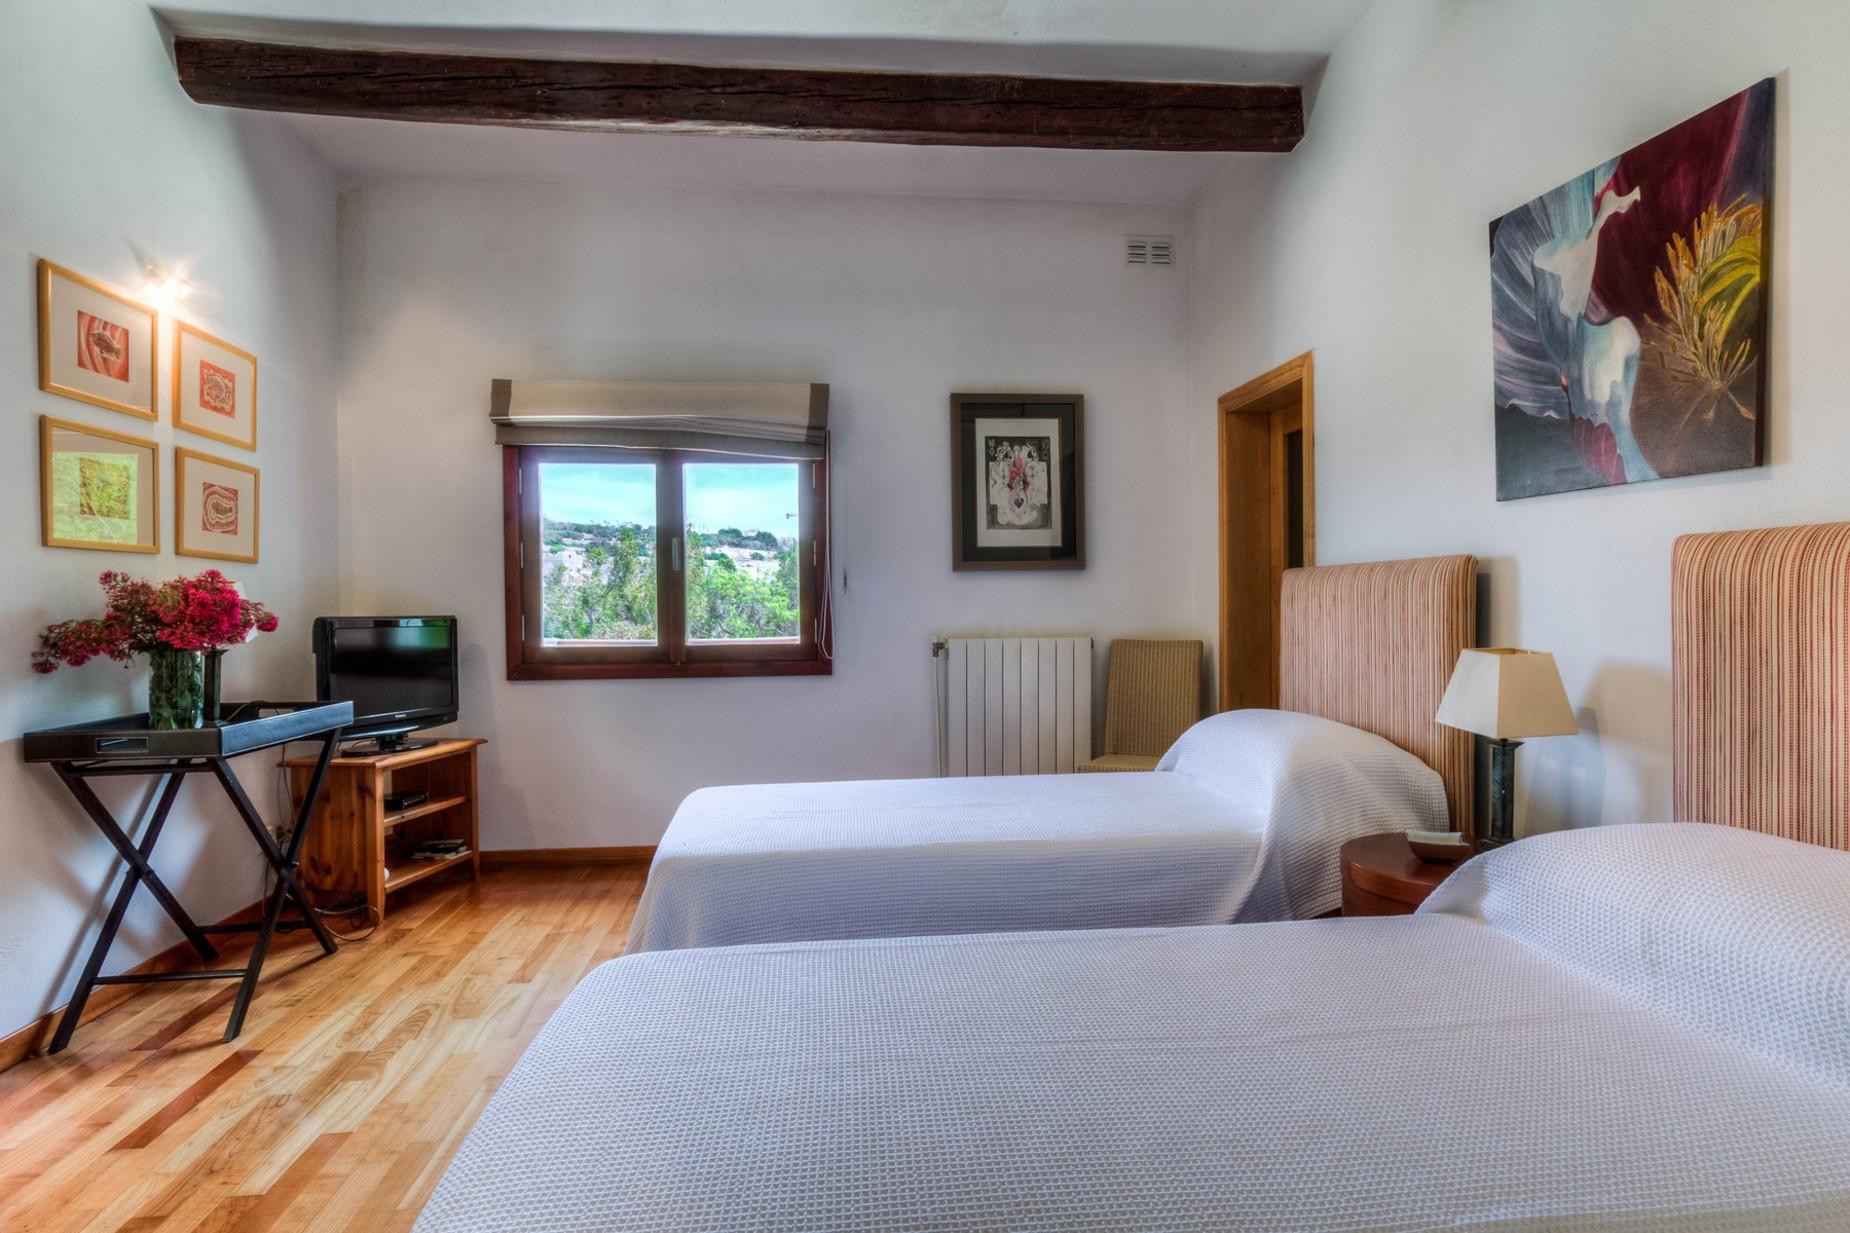 4 bed Villa For Sale in Gharghur, Gharghur - thumb 10